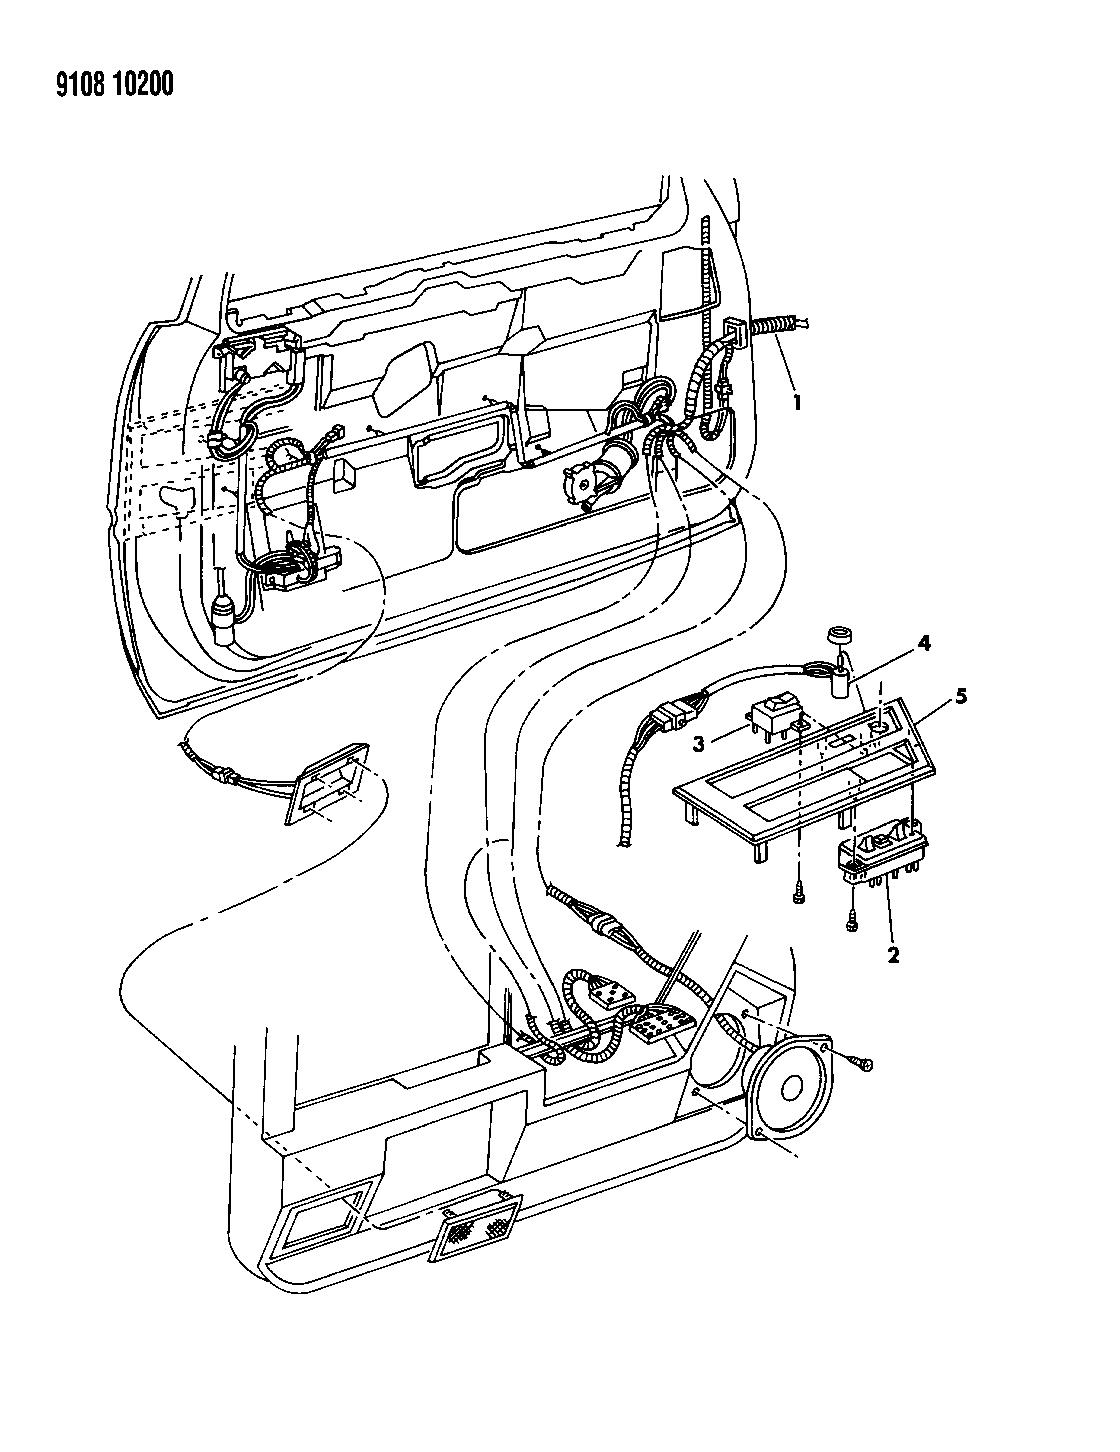 1989 Chrysler Lebaron Gtc Wiring Switches Front Door Diagram